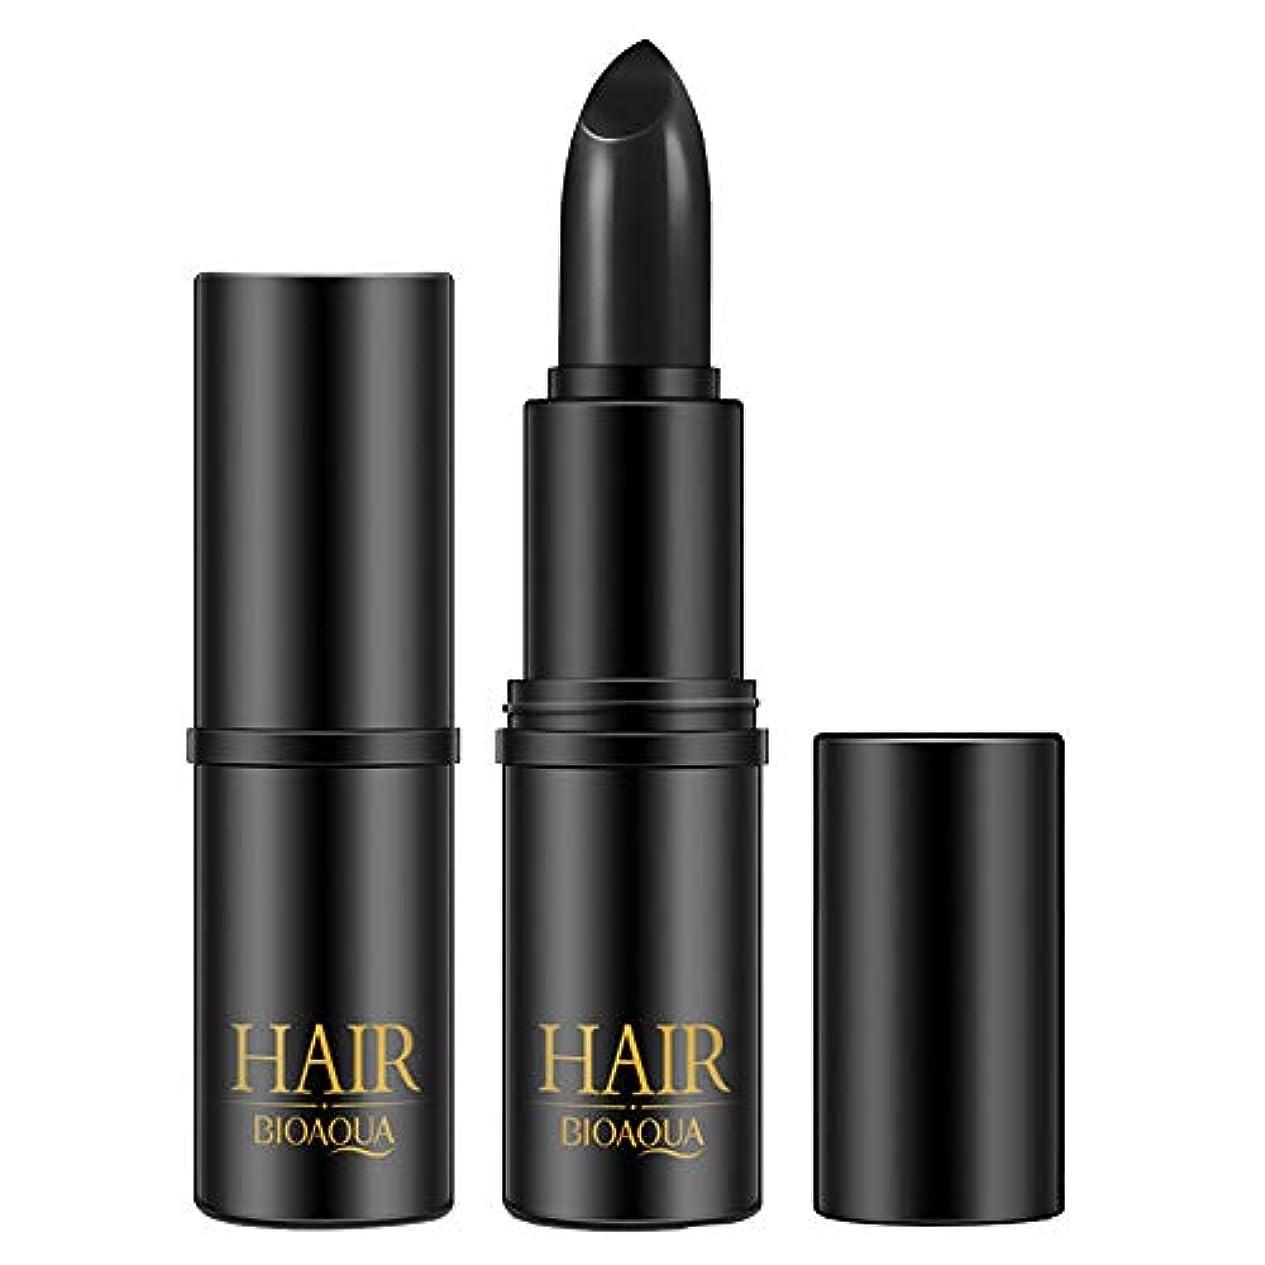 Osmnice 美容院ペングルーミングクリーム染めヘアピン髪染め櫛100%安全で無毒の速い髪染め年長の友人ギフト (黒)